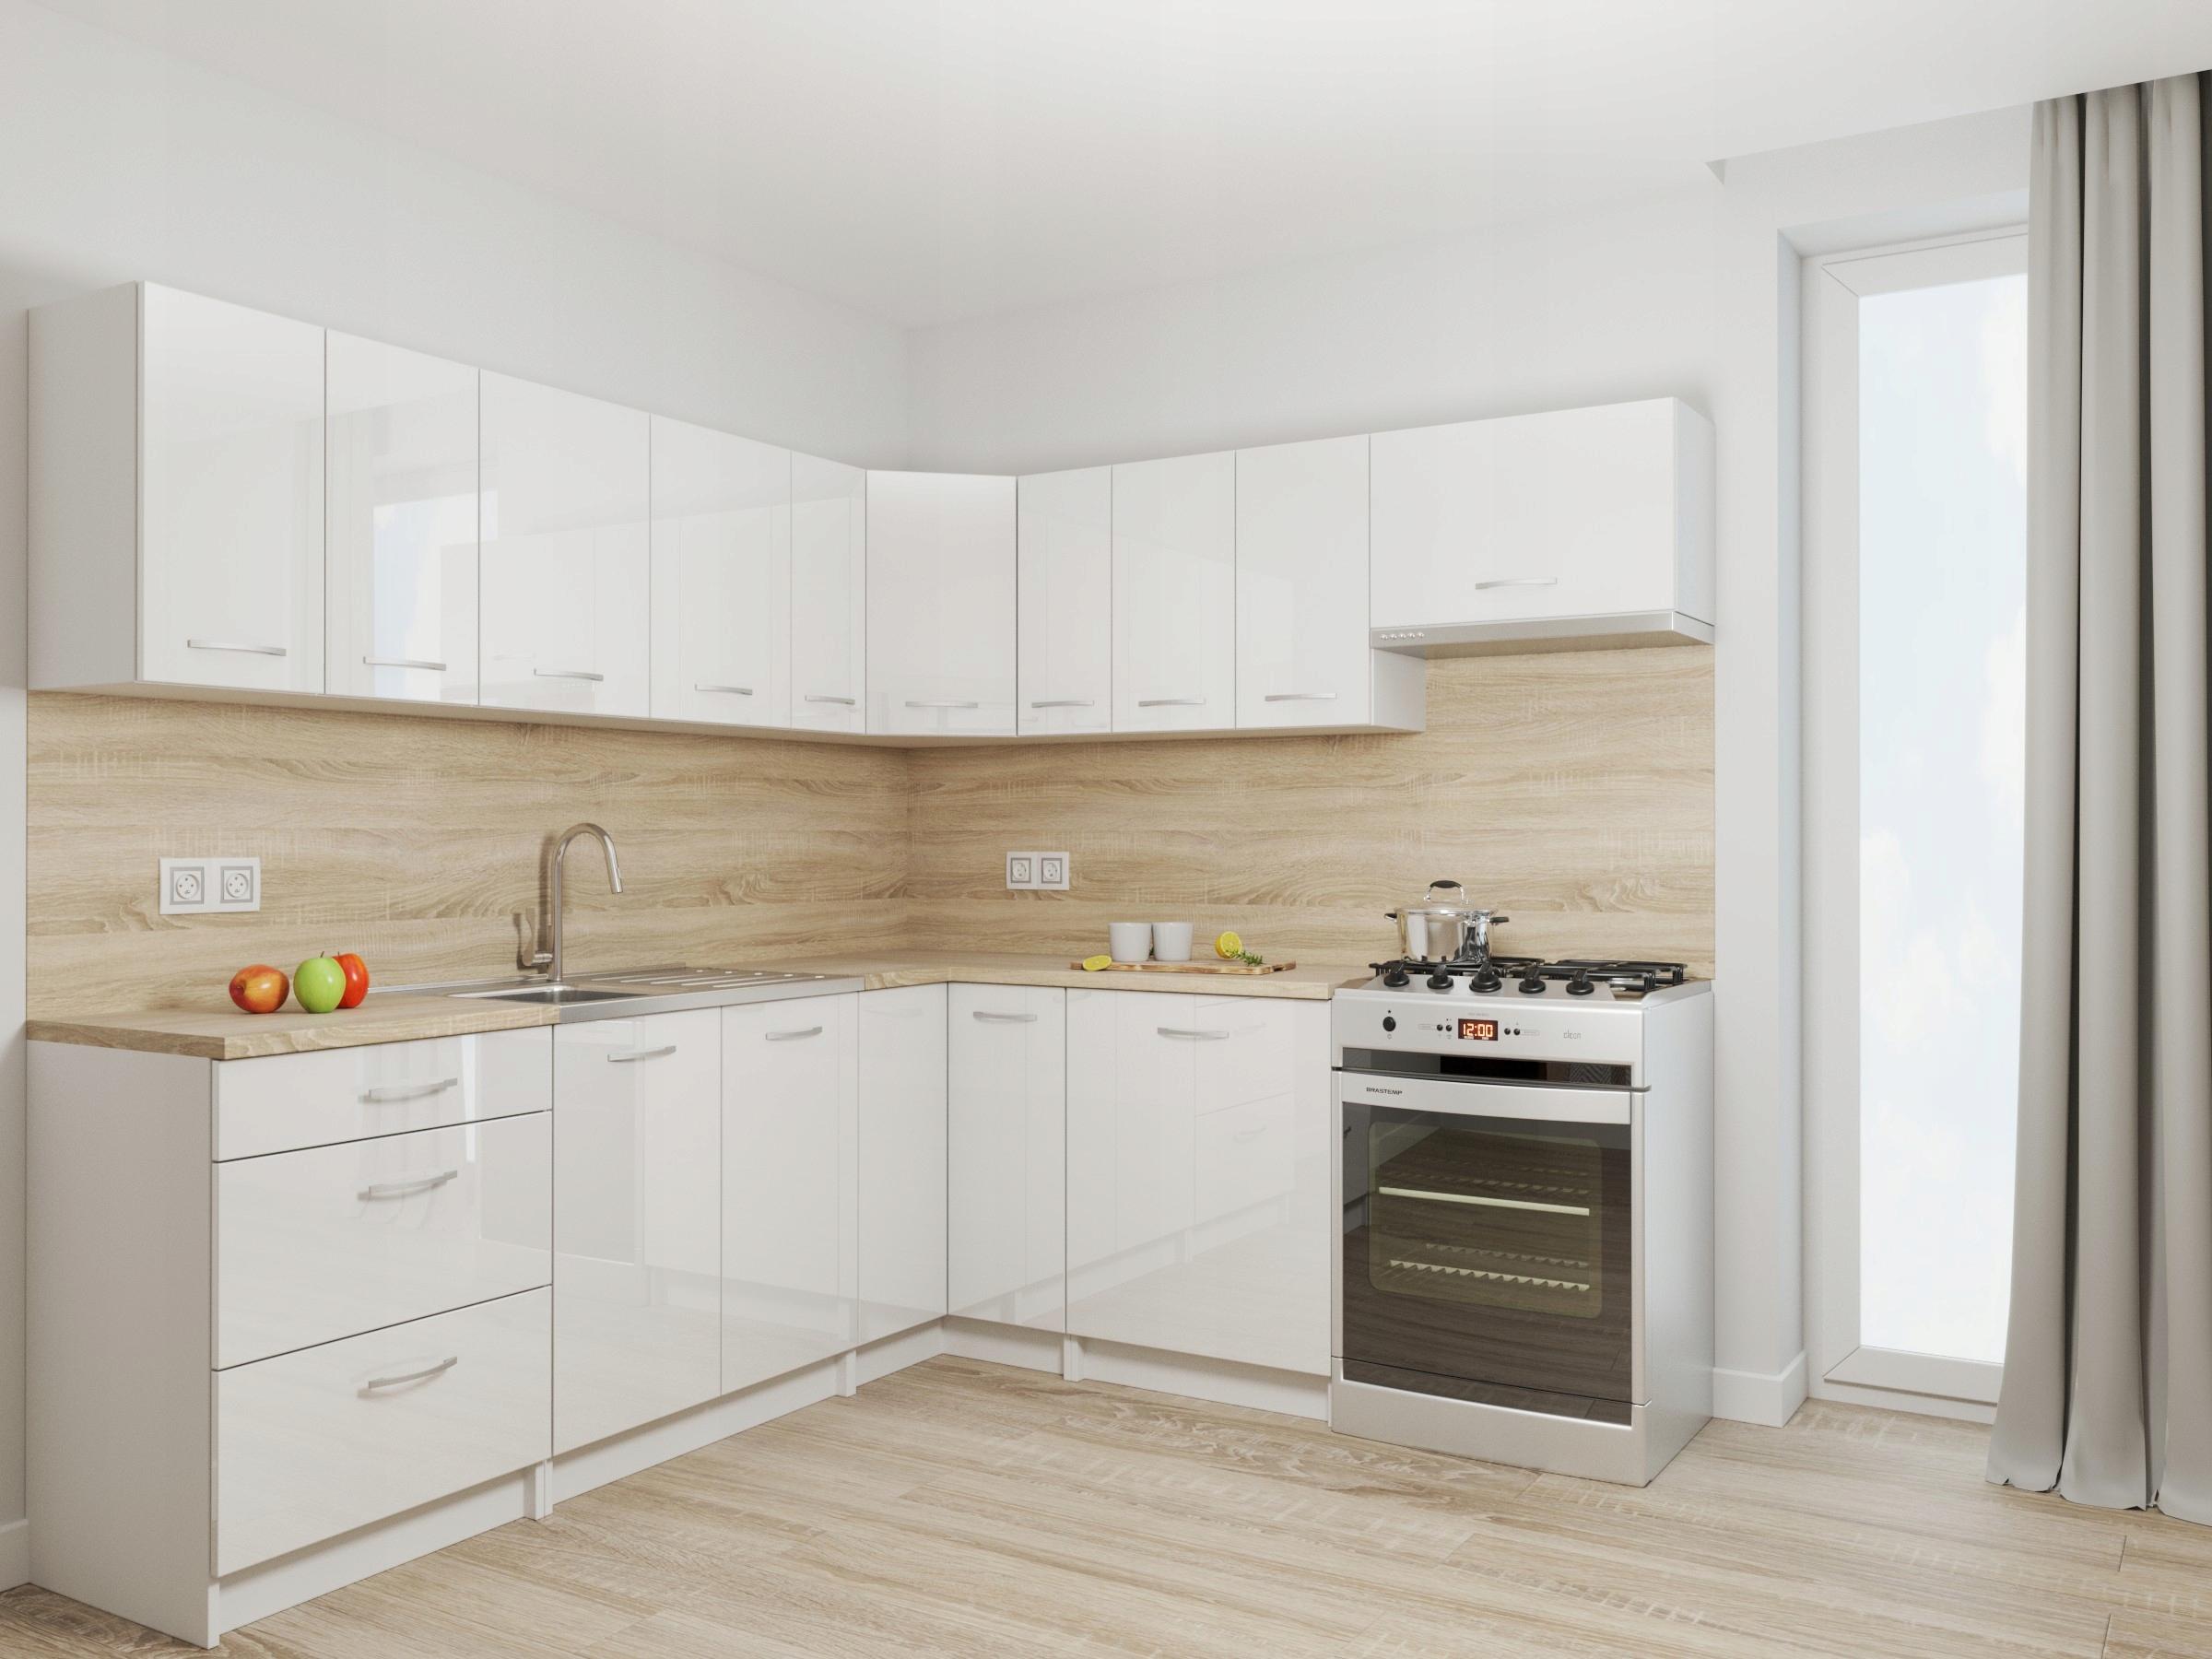 Комплект кухонной мебели Rhodes White GLOSS + столешница